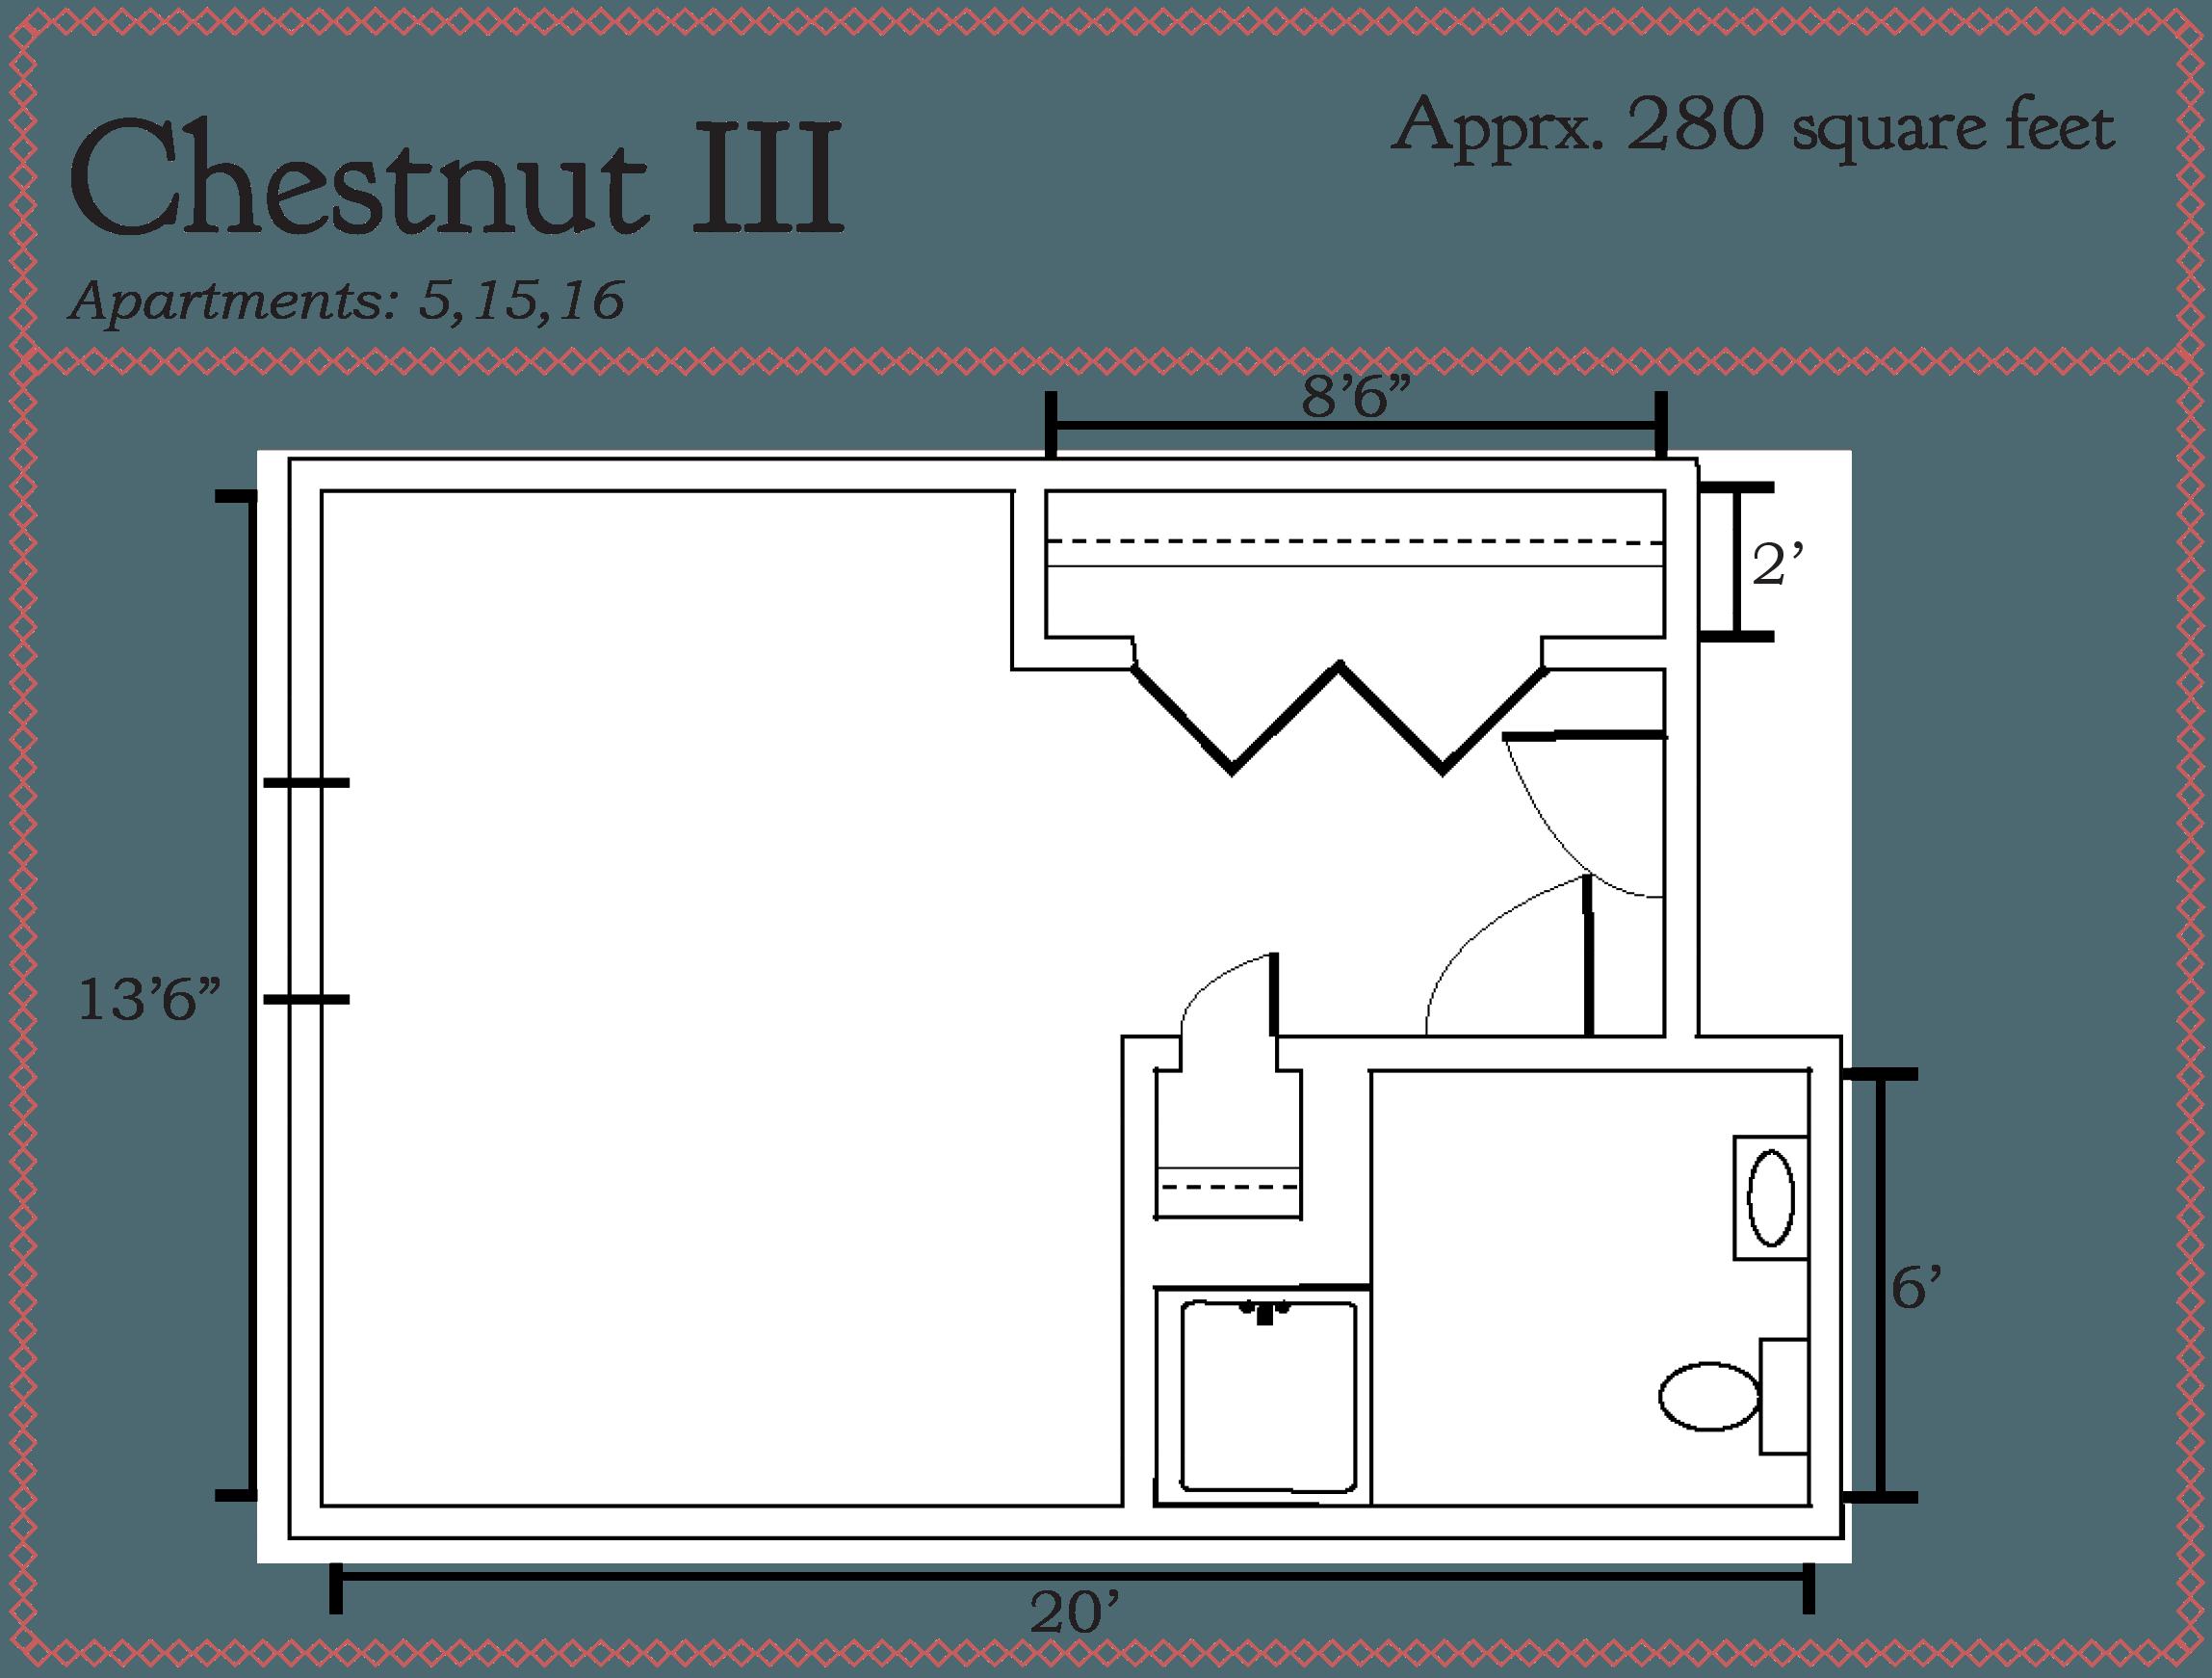 Chestnut III